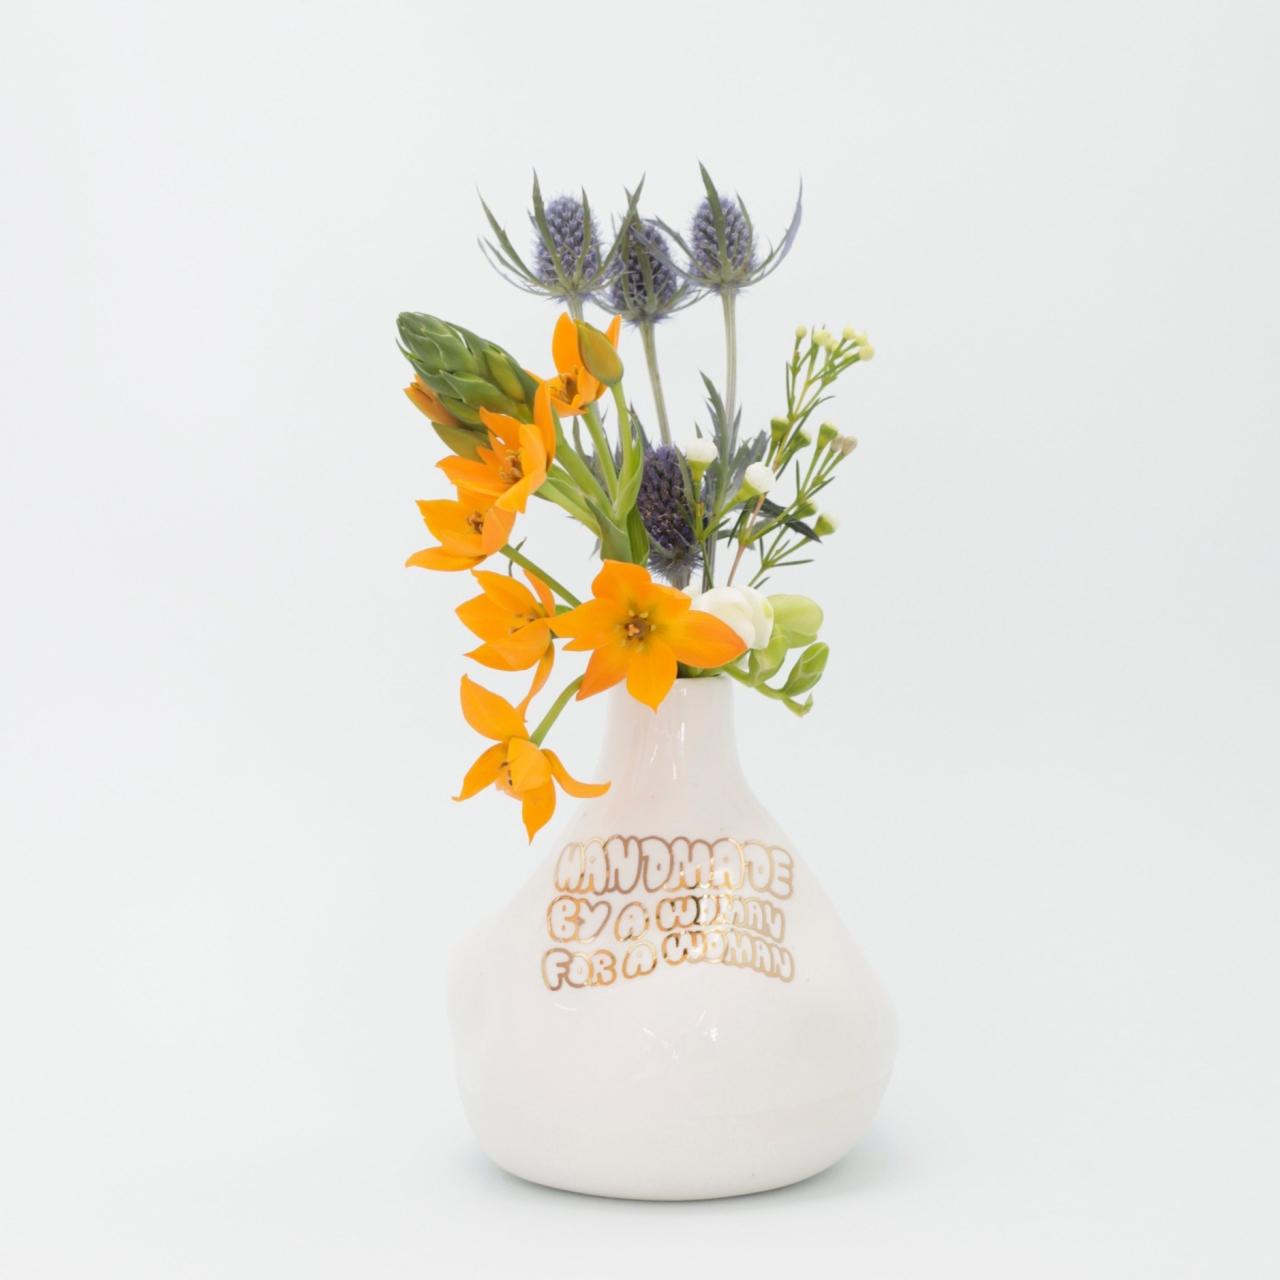 Porcelain vase handmade by a women for a women by Cybele B.Pilon